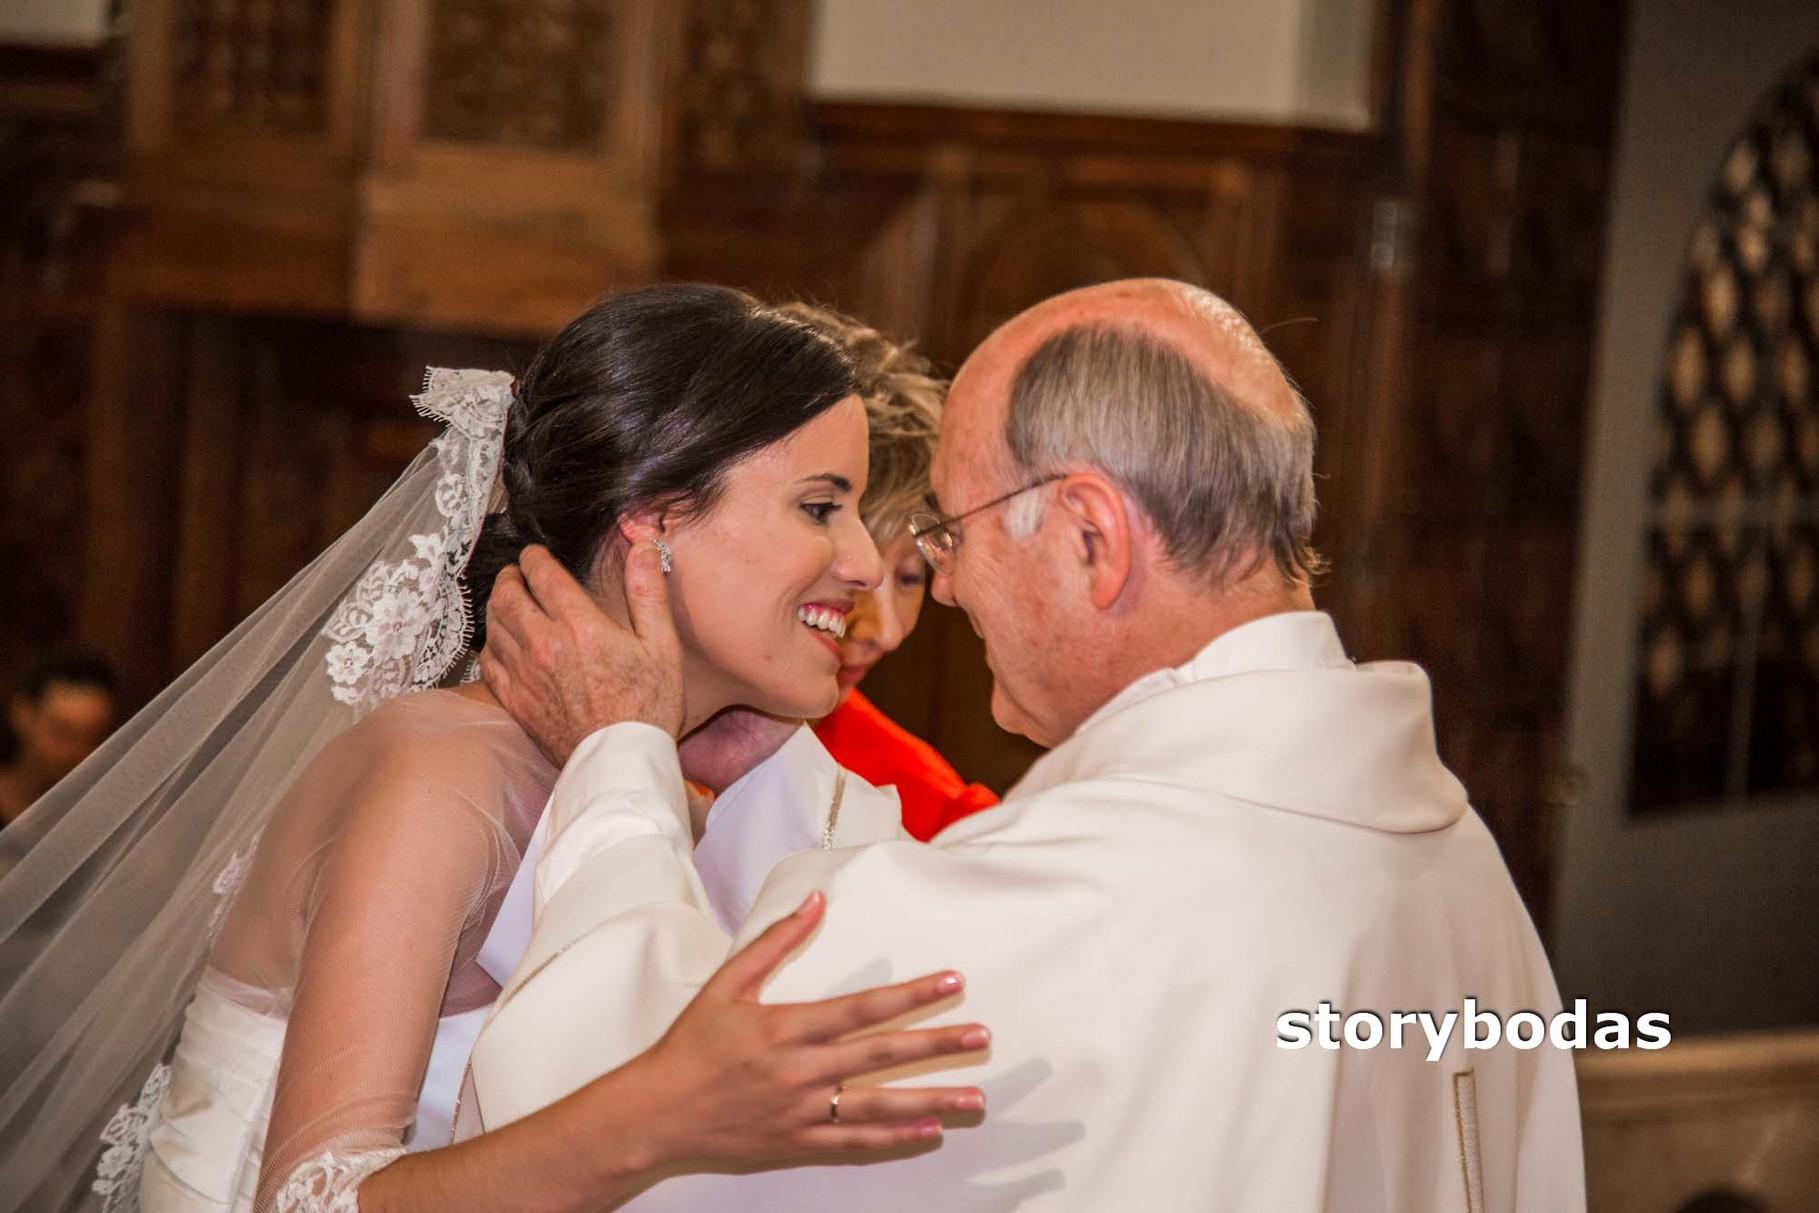 storybodas Rito del Matrimonio Novios, Padrinos y Sacerdote